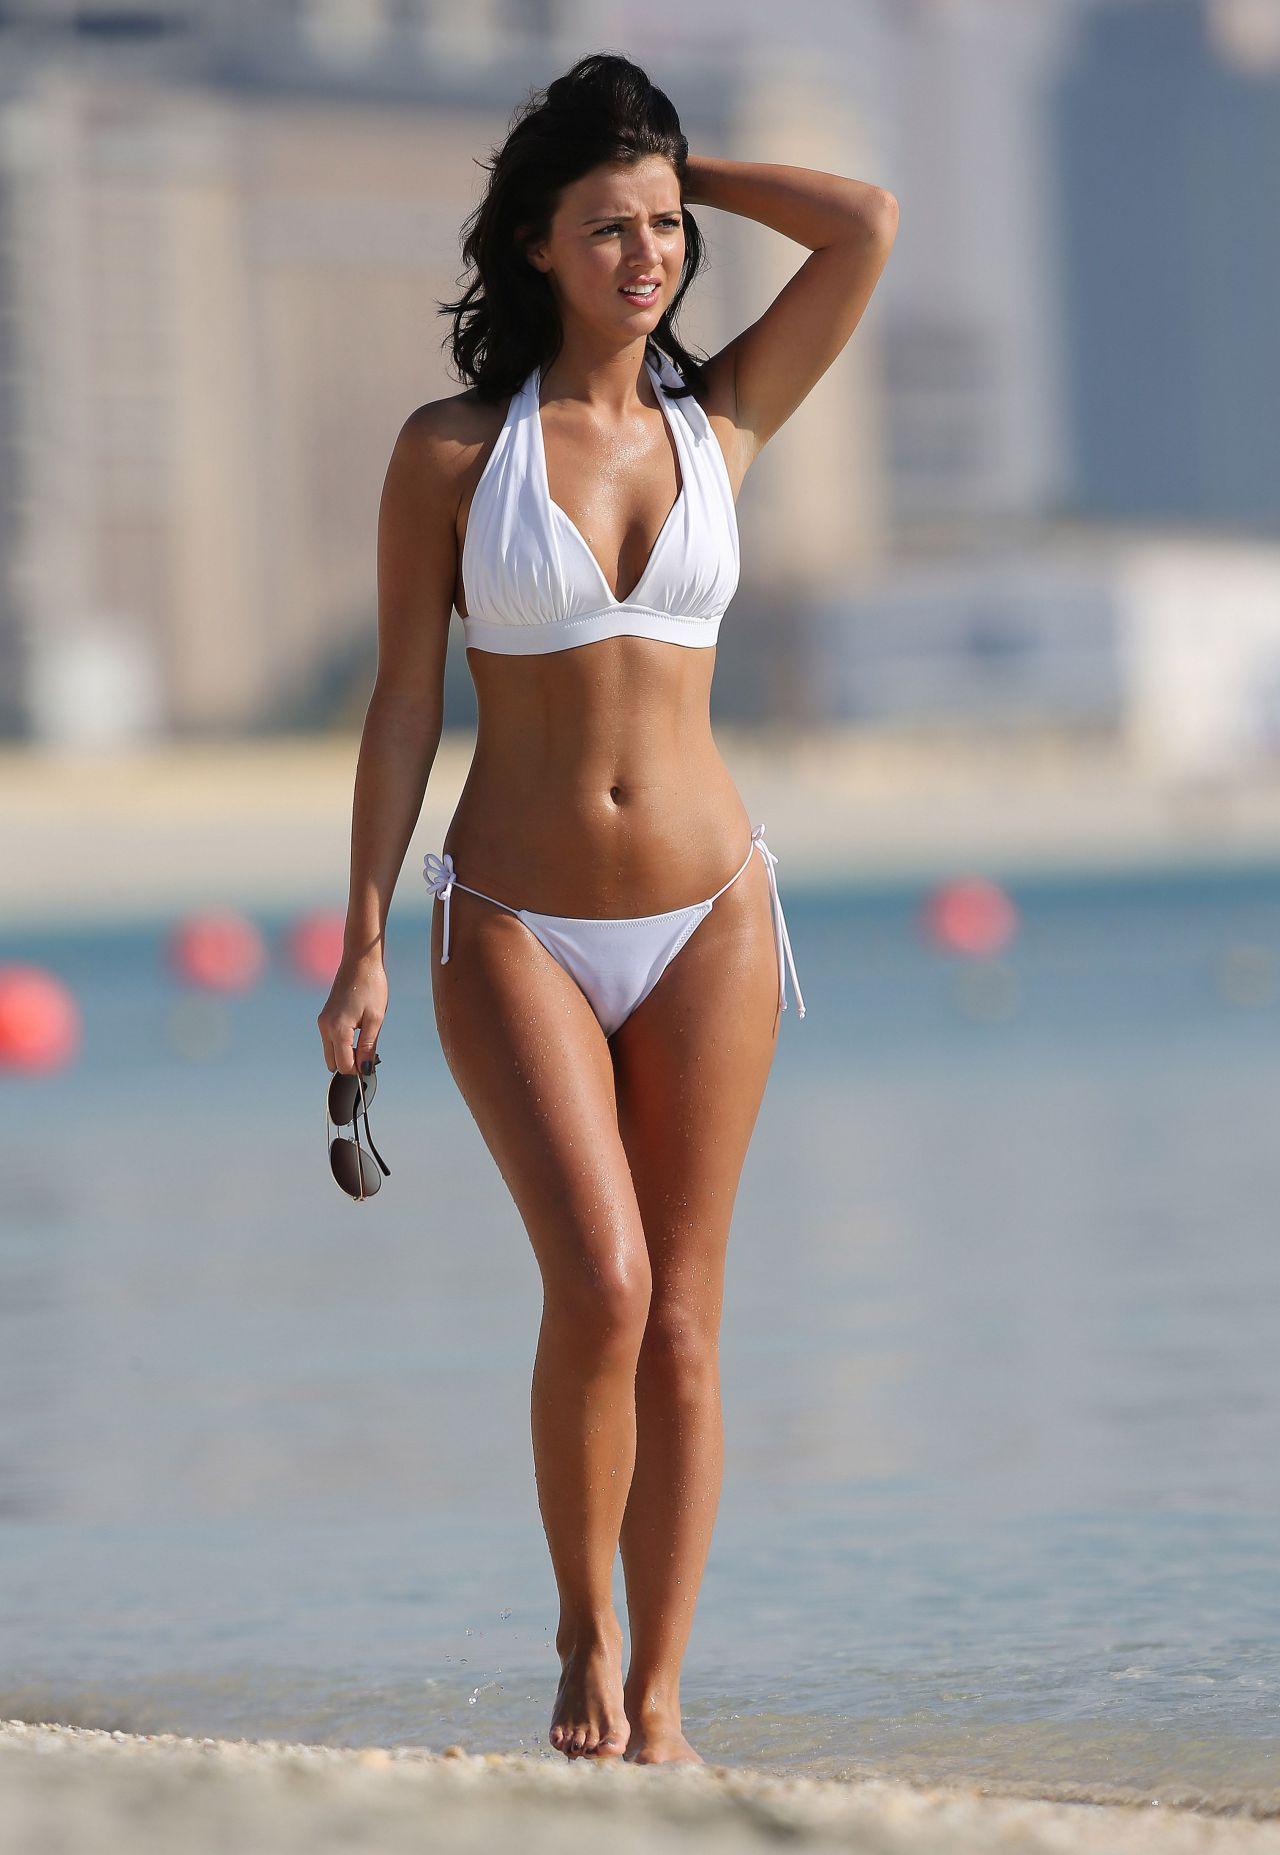 Lucy Mecklenburgh Hot In Bikini Dubai March 2014